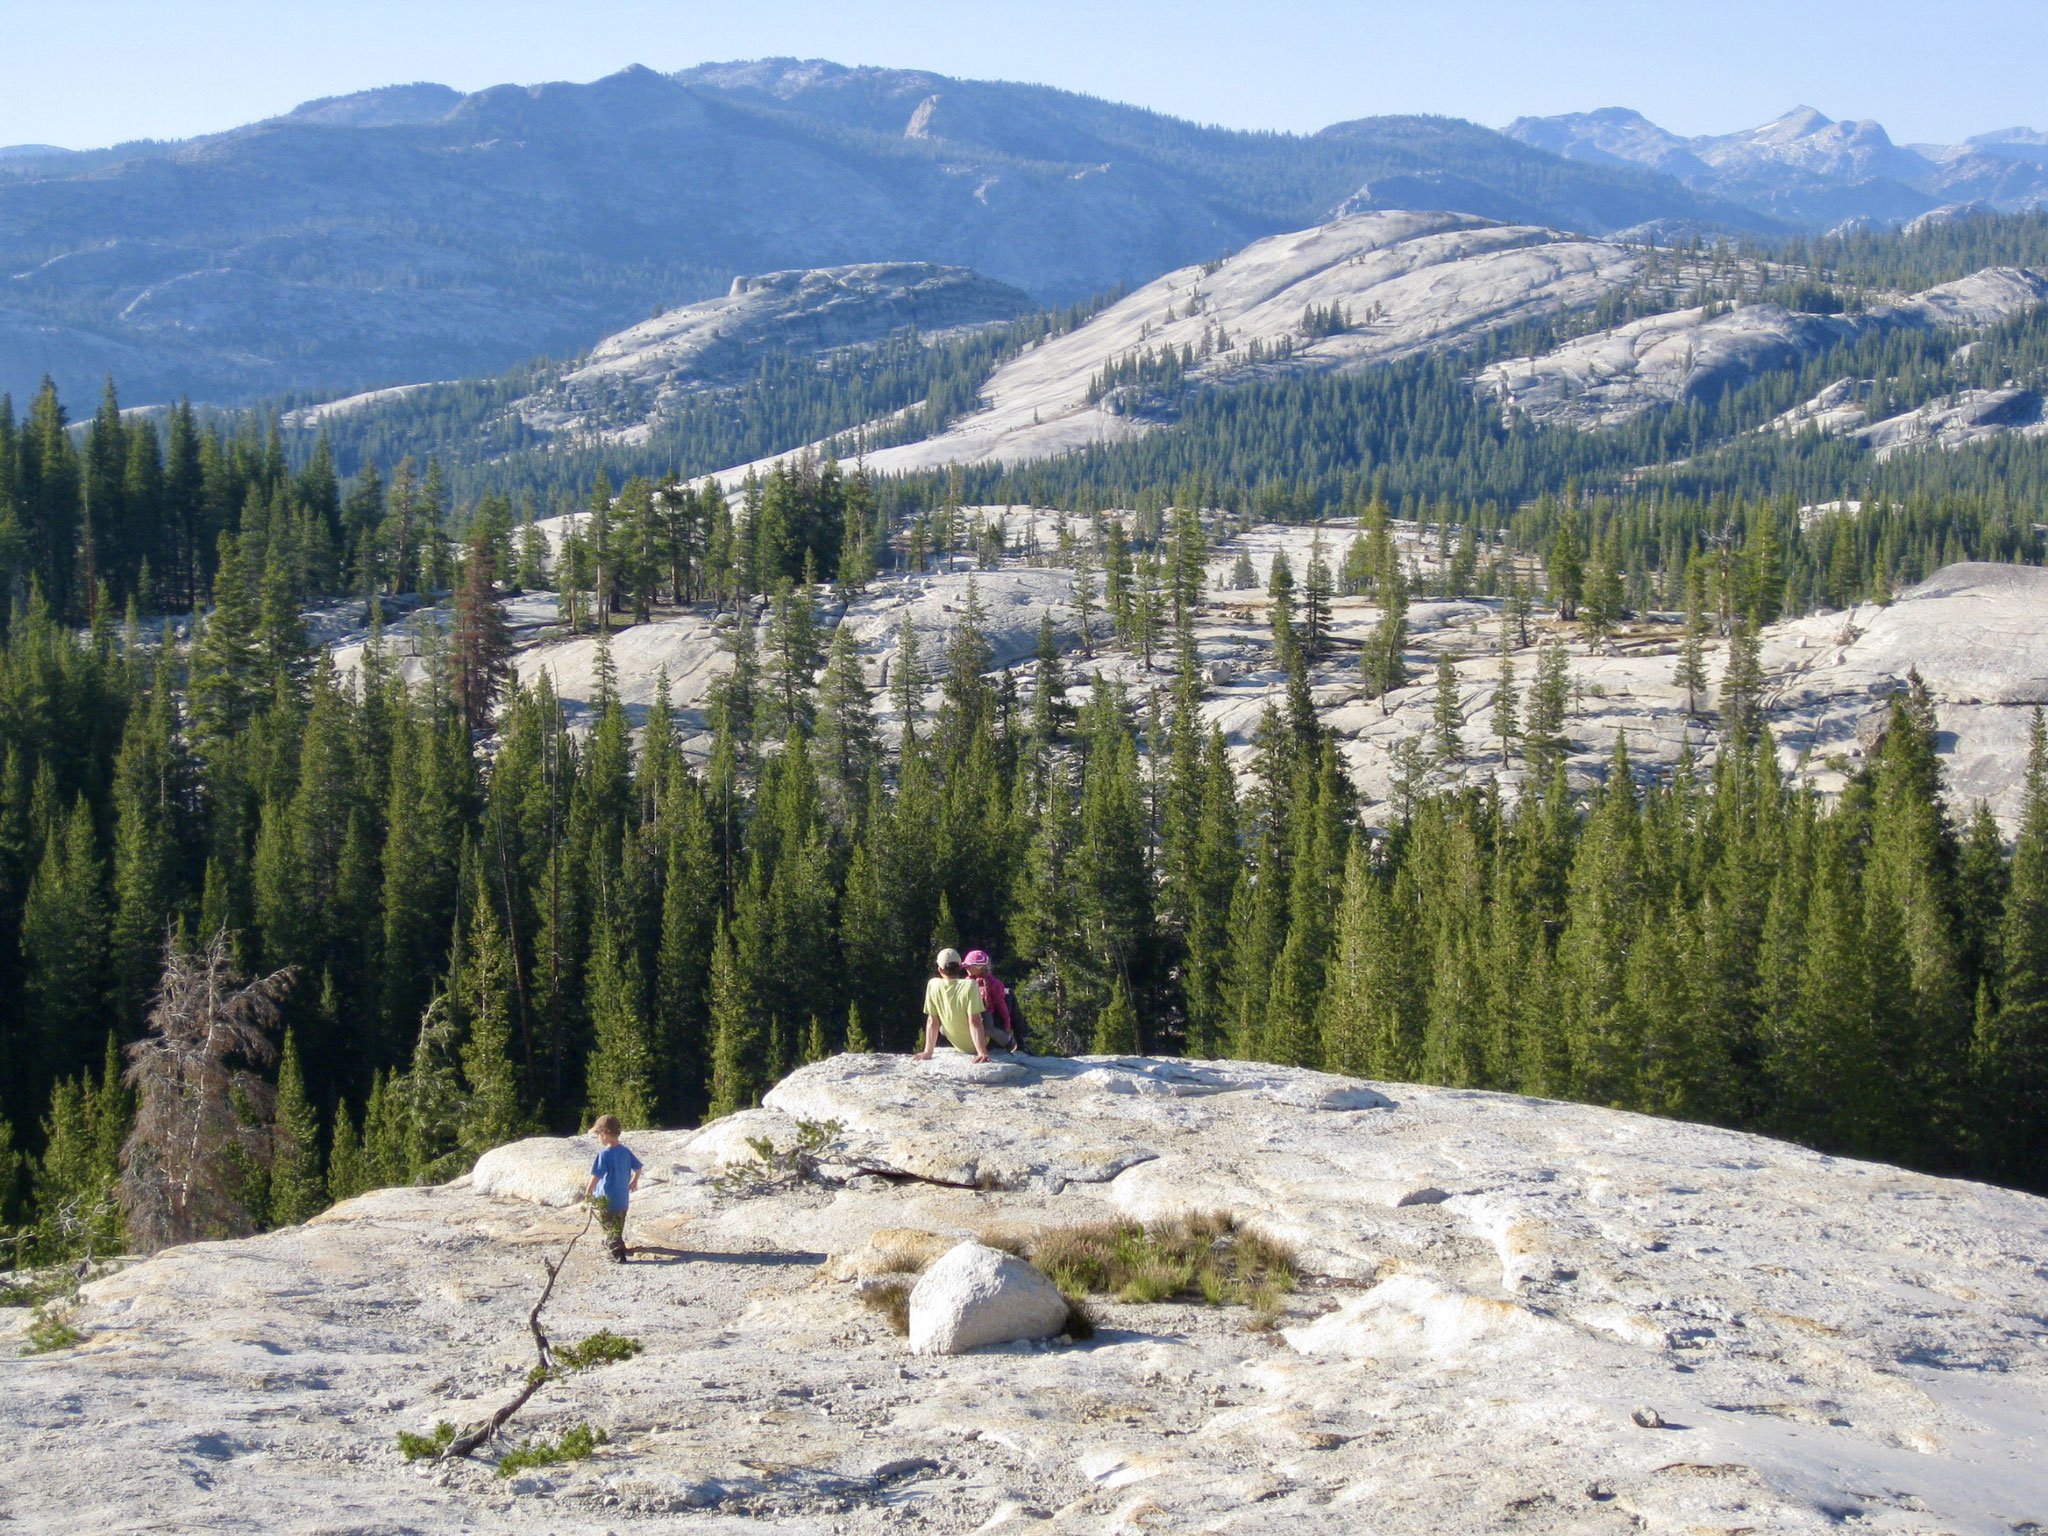 Yosemite National Park hinter Daff Dome einfach den Felsen entlang